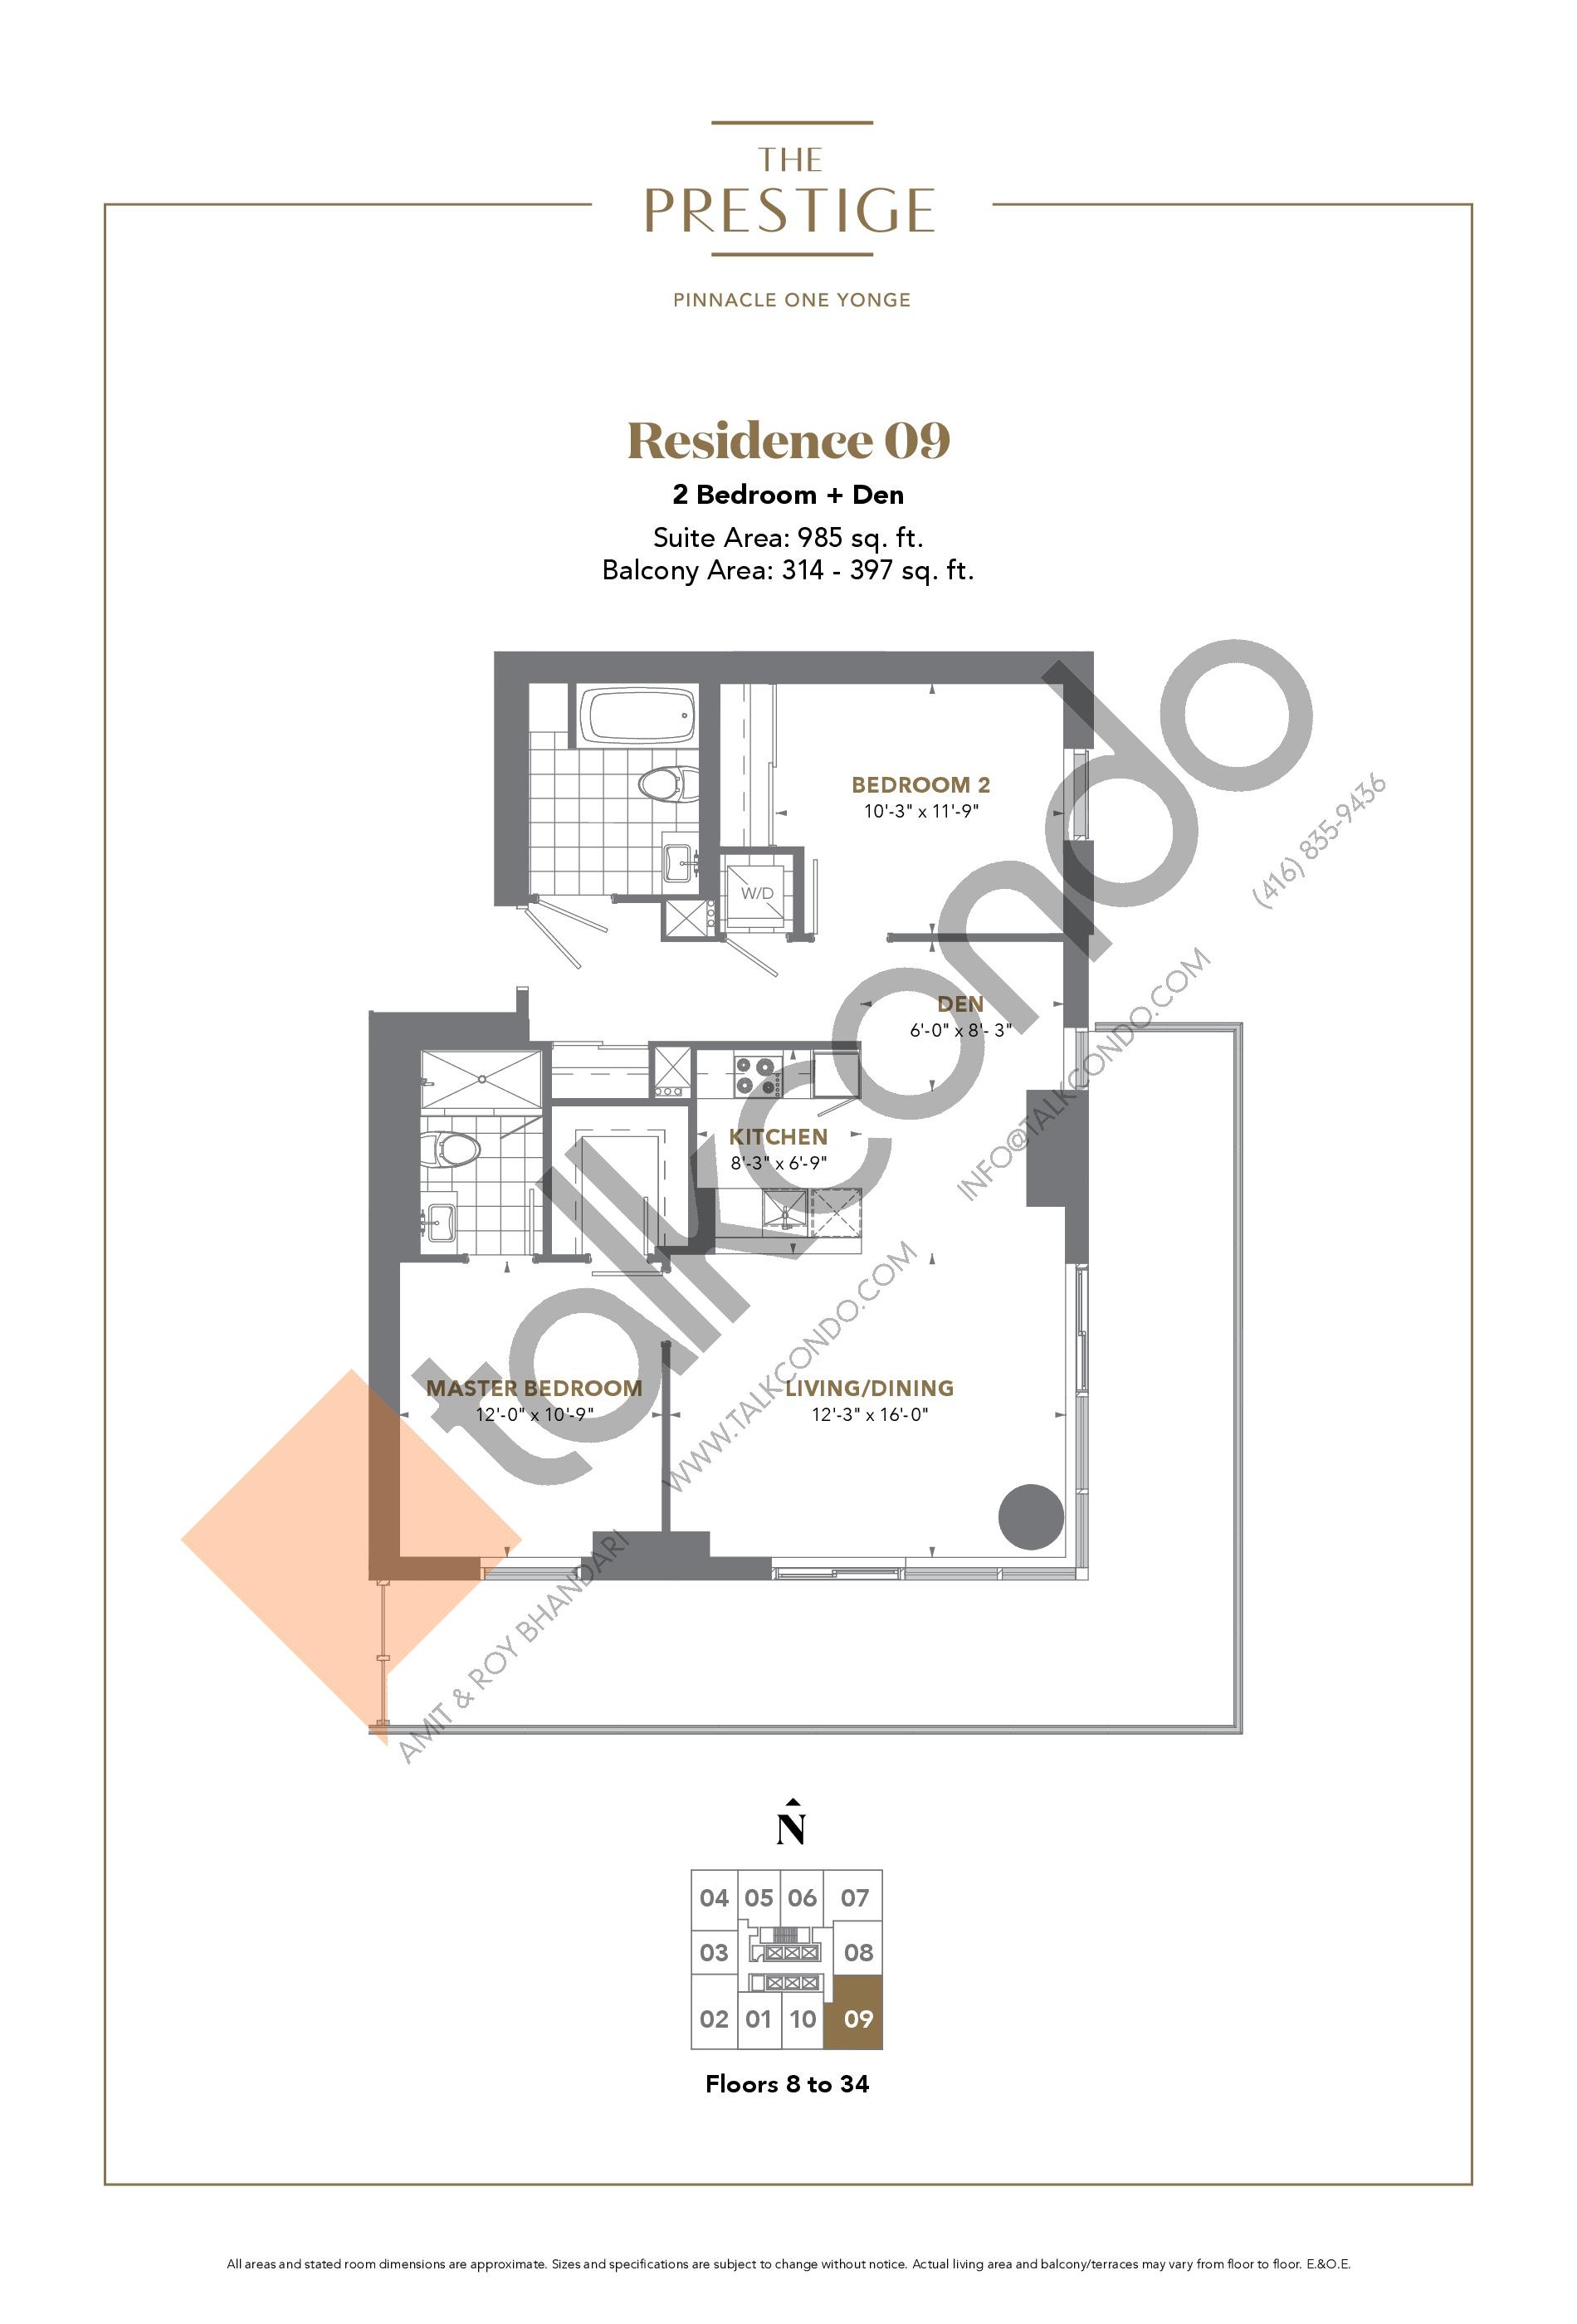 Residence 09 Floor Plan at The Prestige Condos at Pinnacle One Yonge - 985 sq.ft